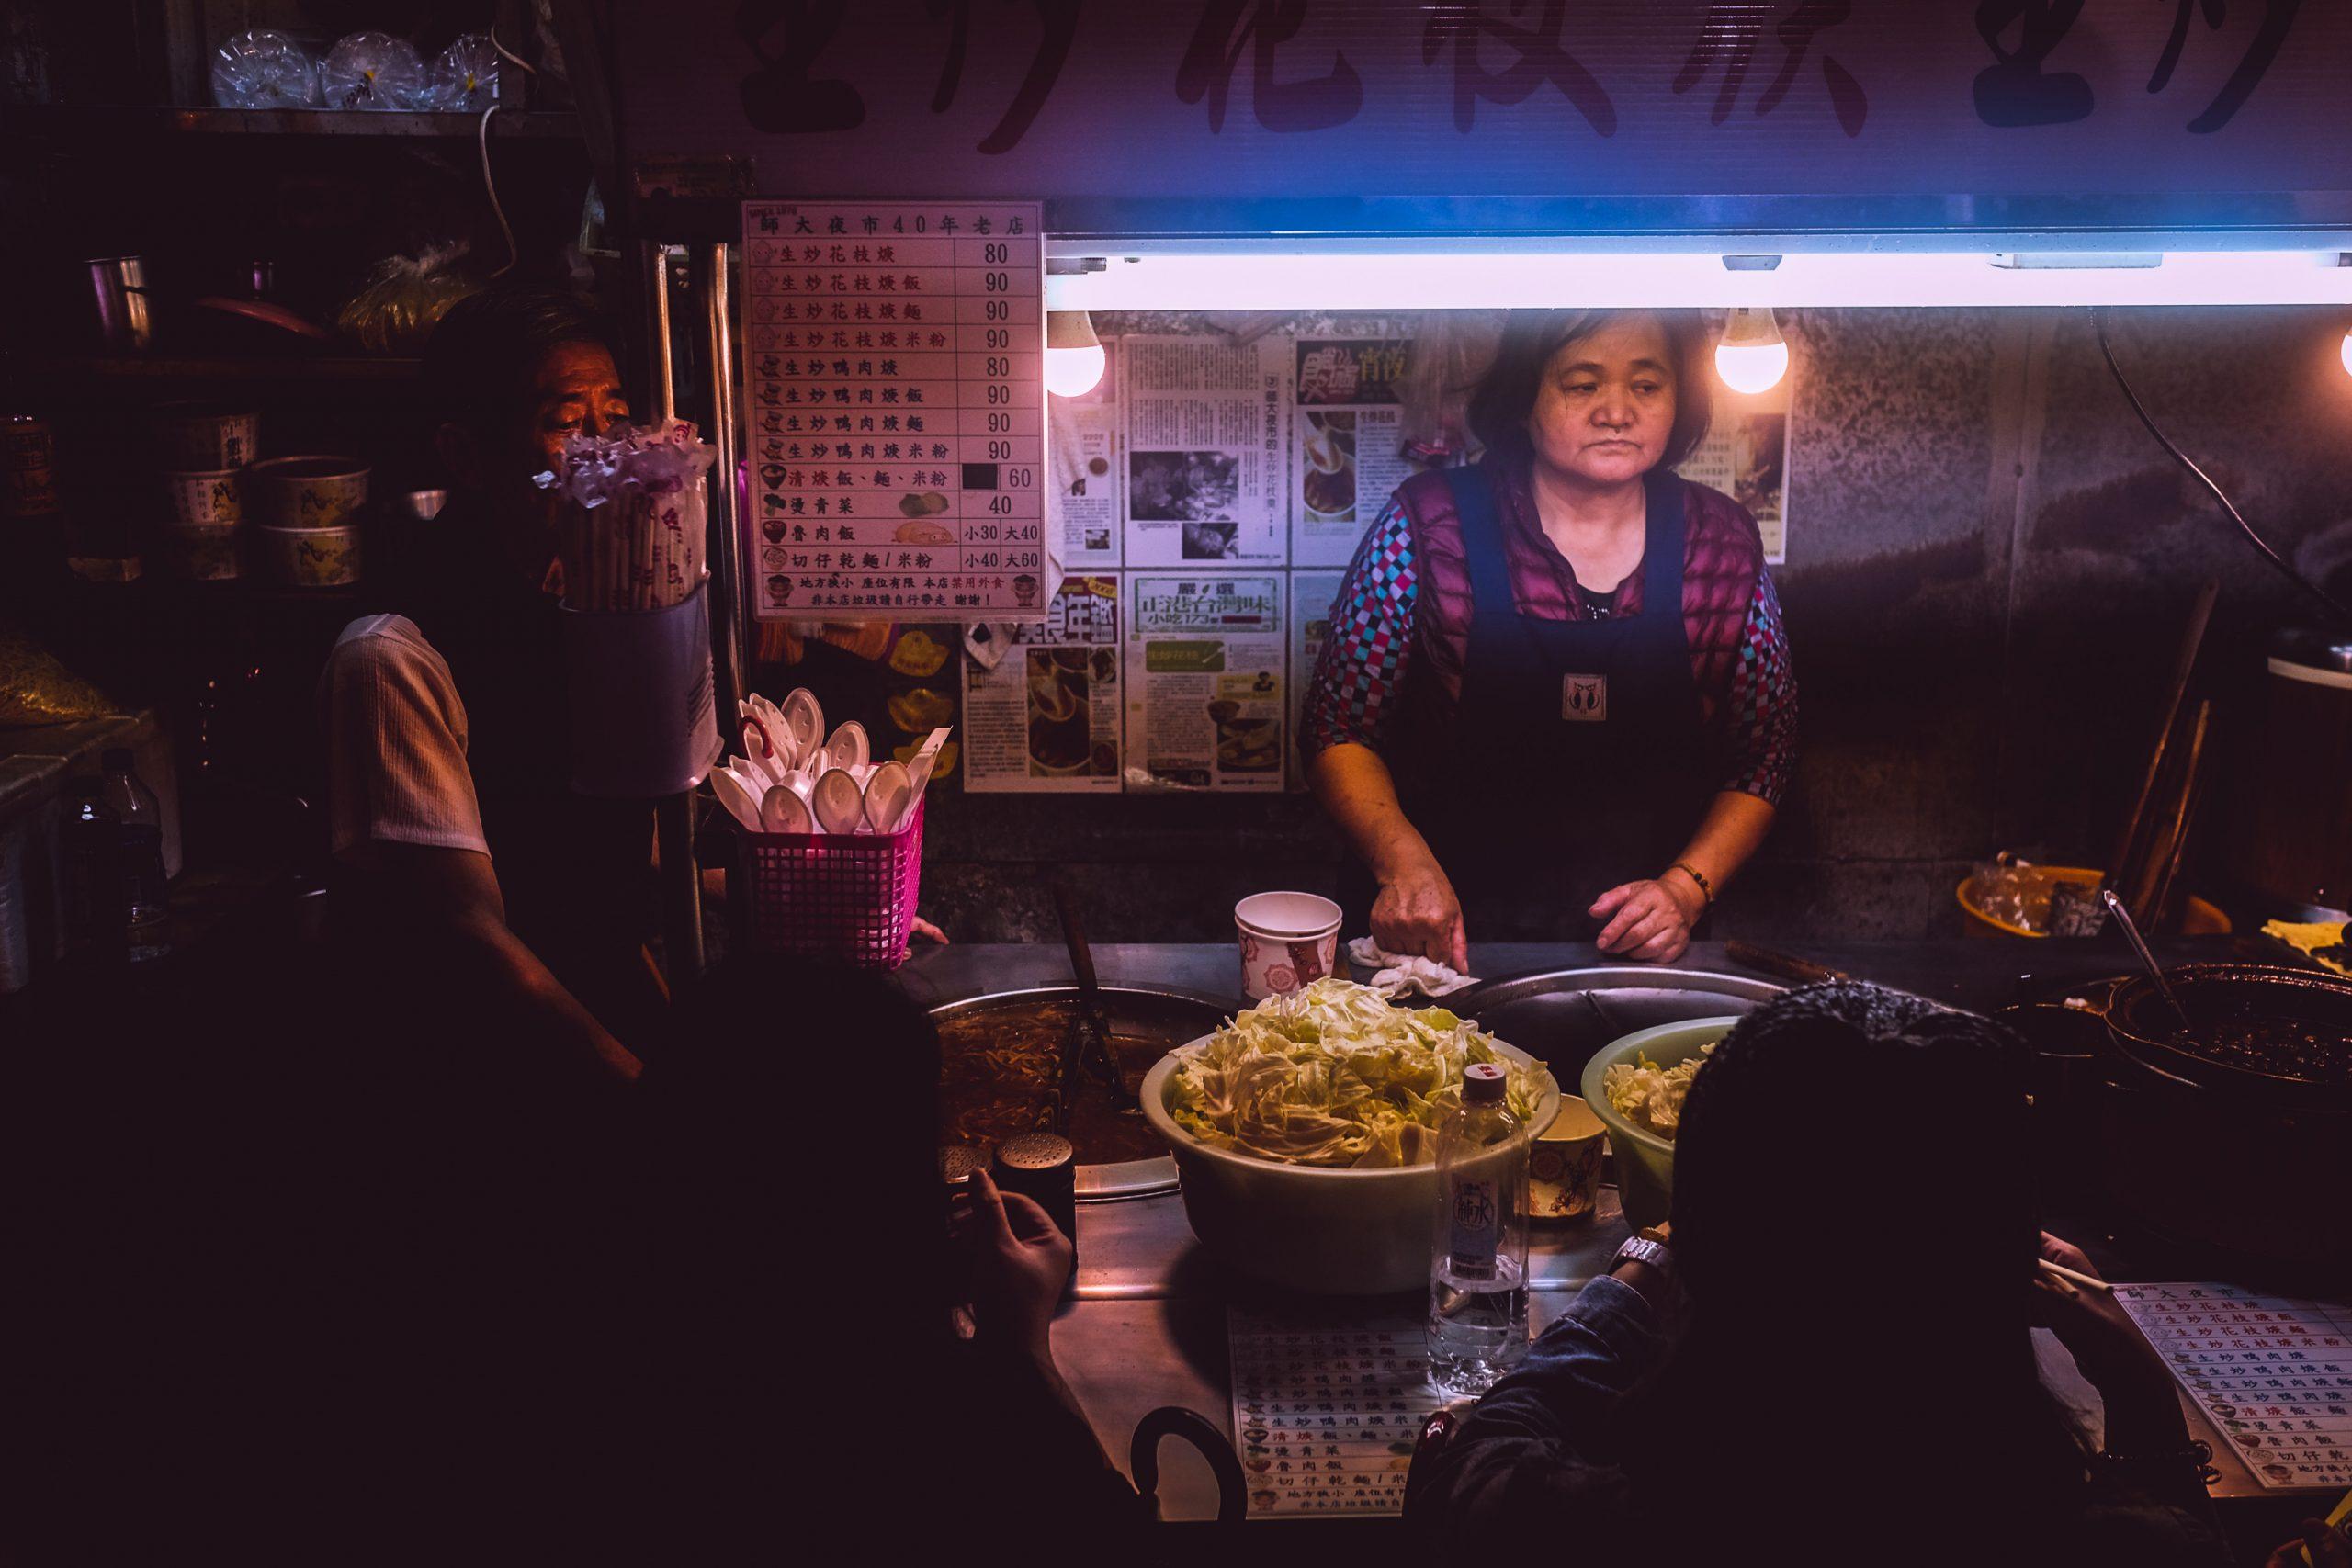 night food market in Taipei